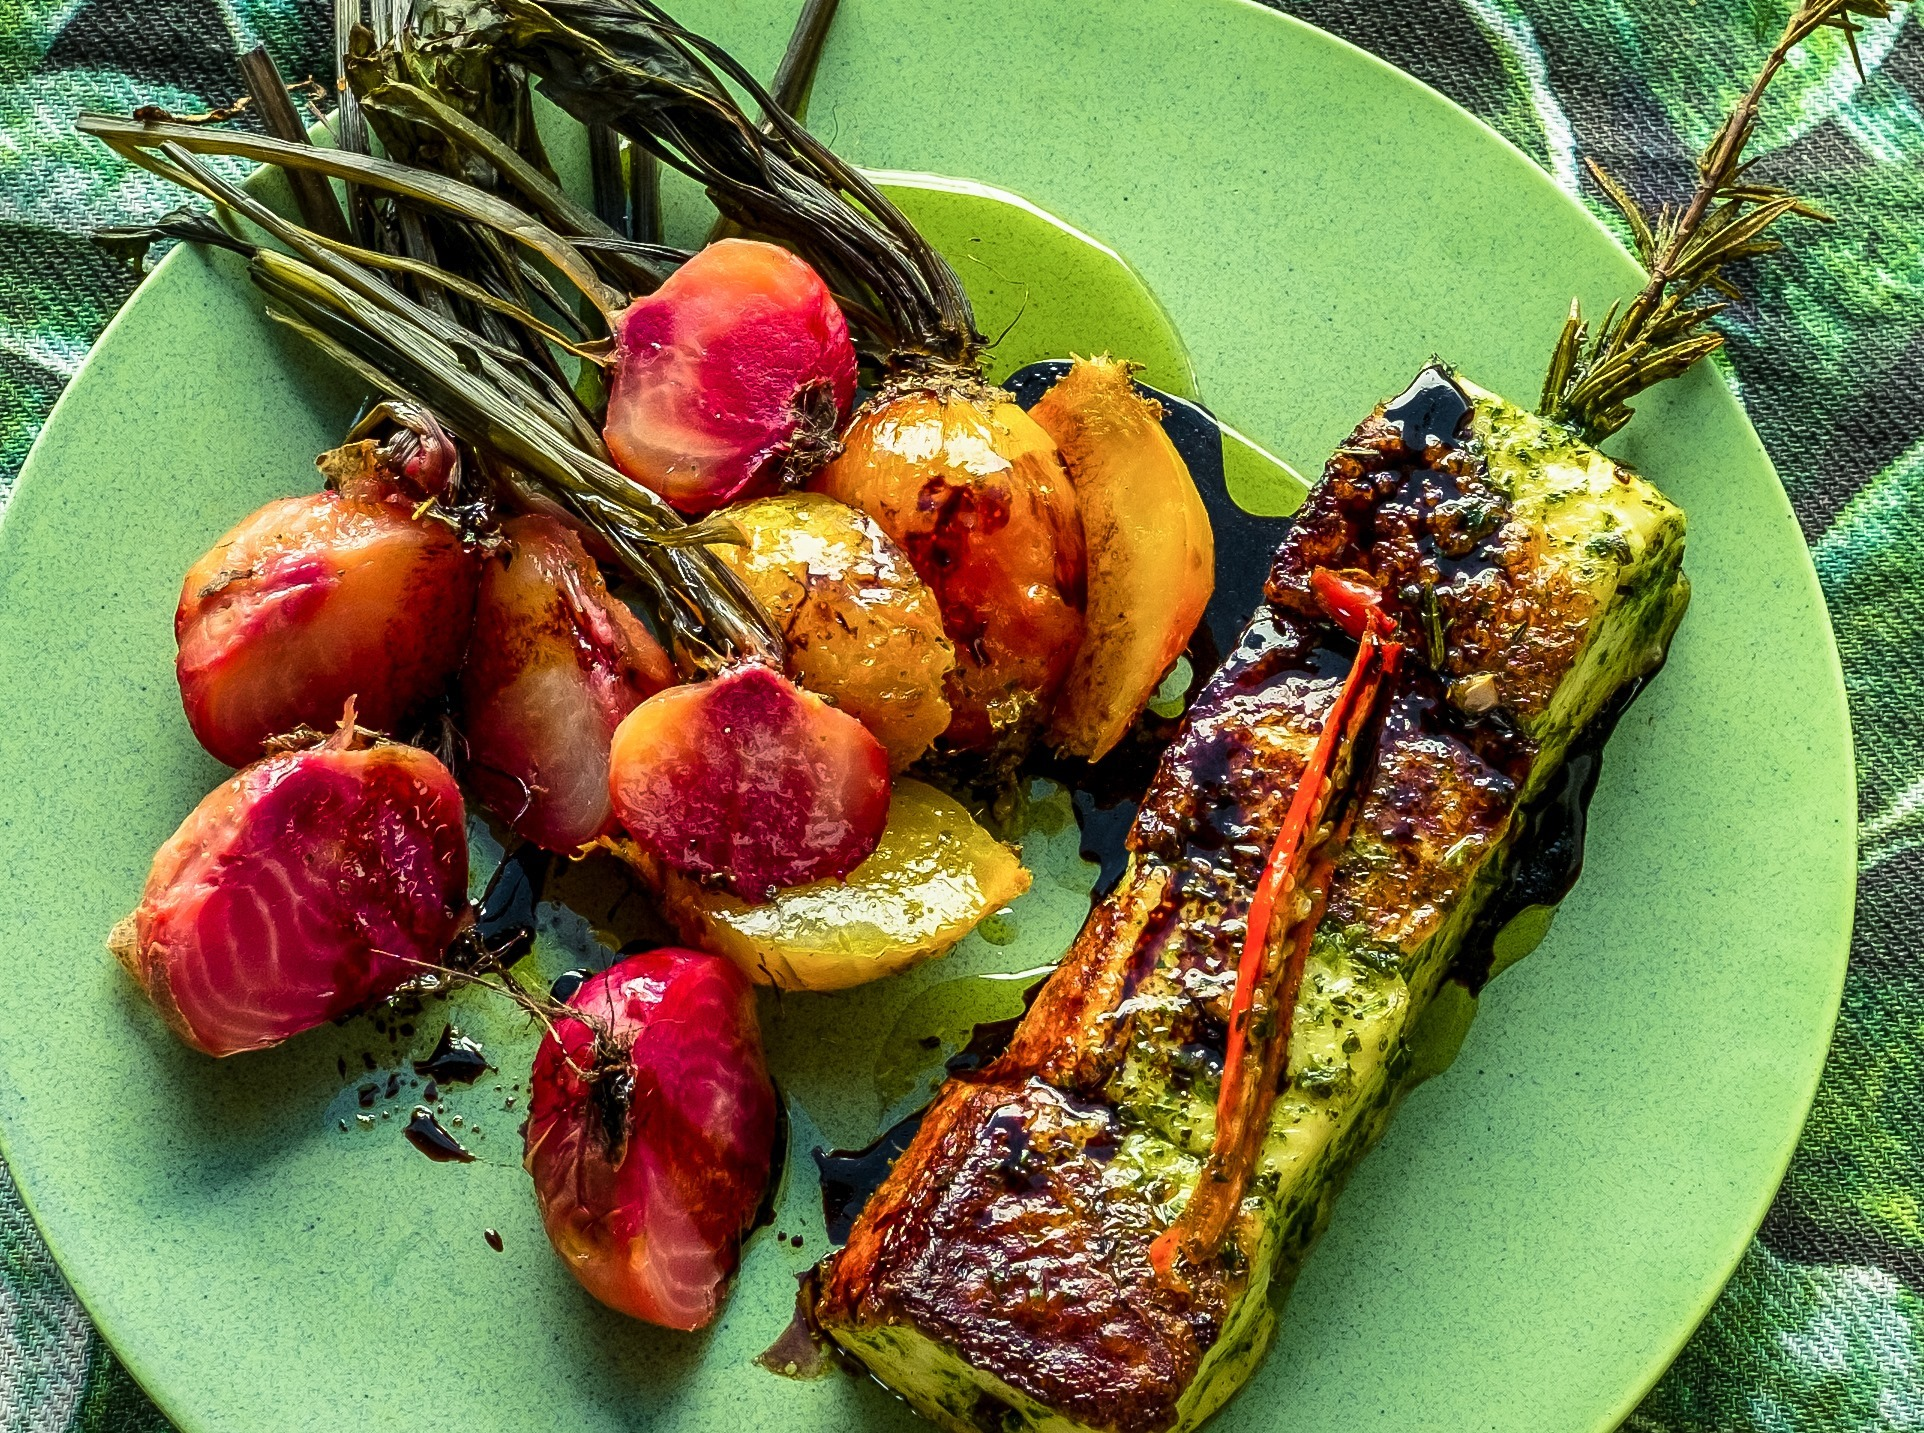 Delicious farm to fork food at Babylonstoren